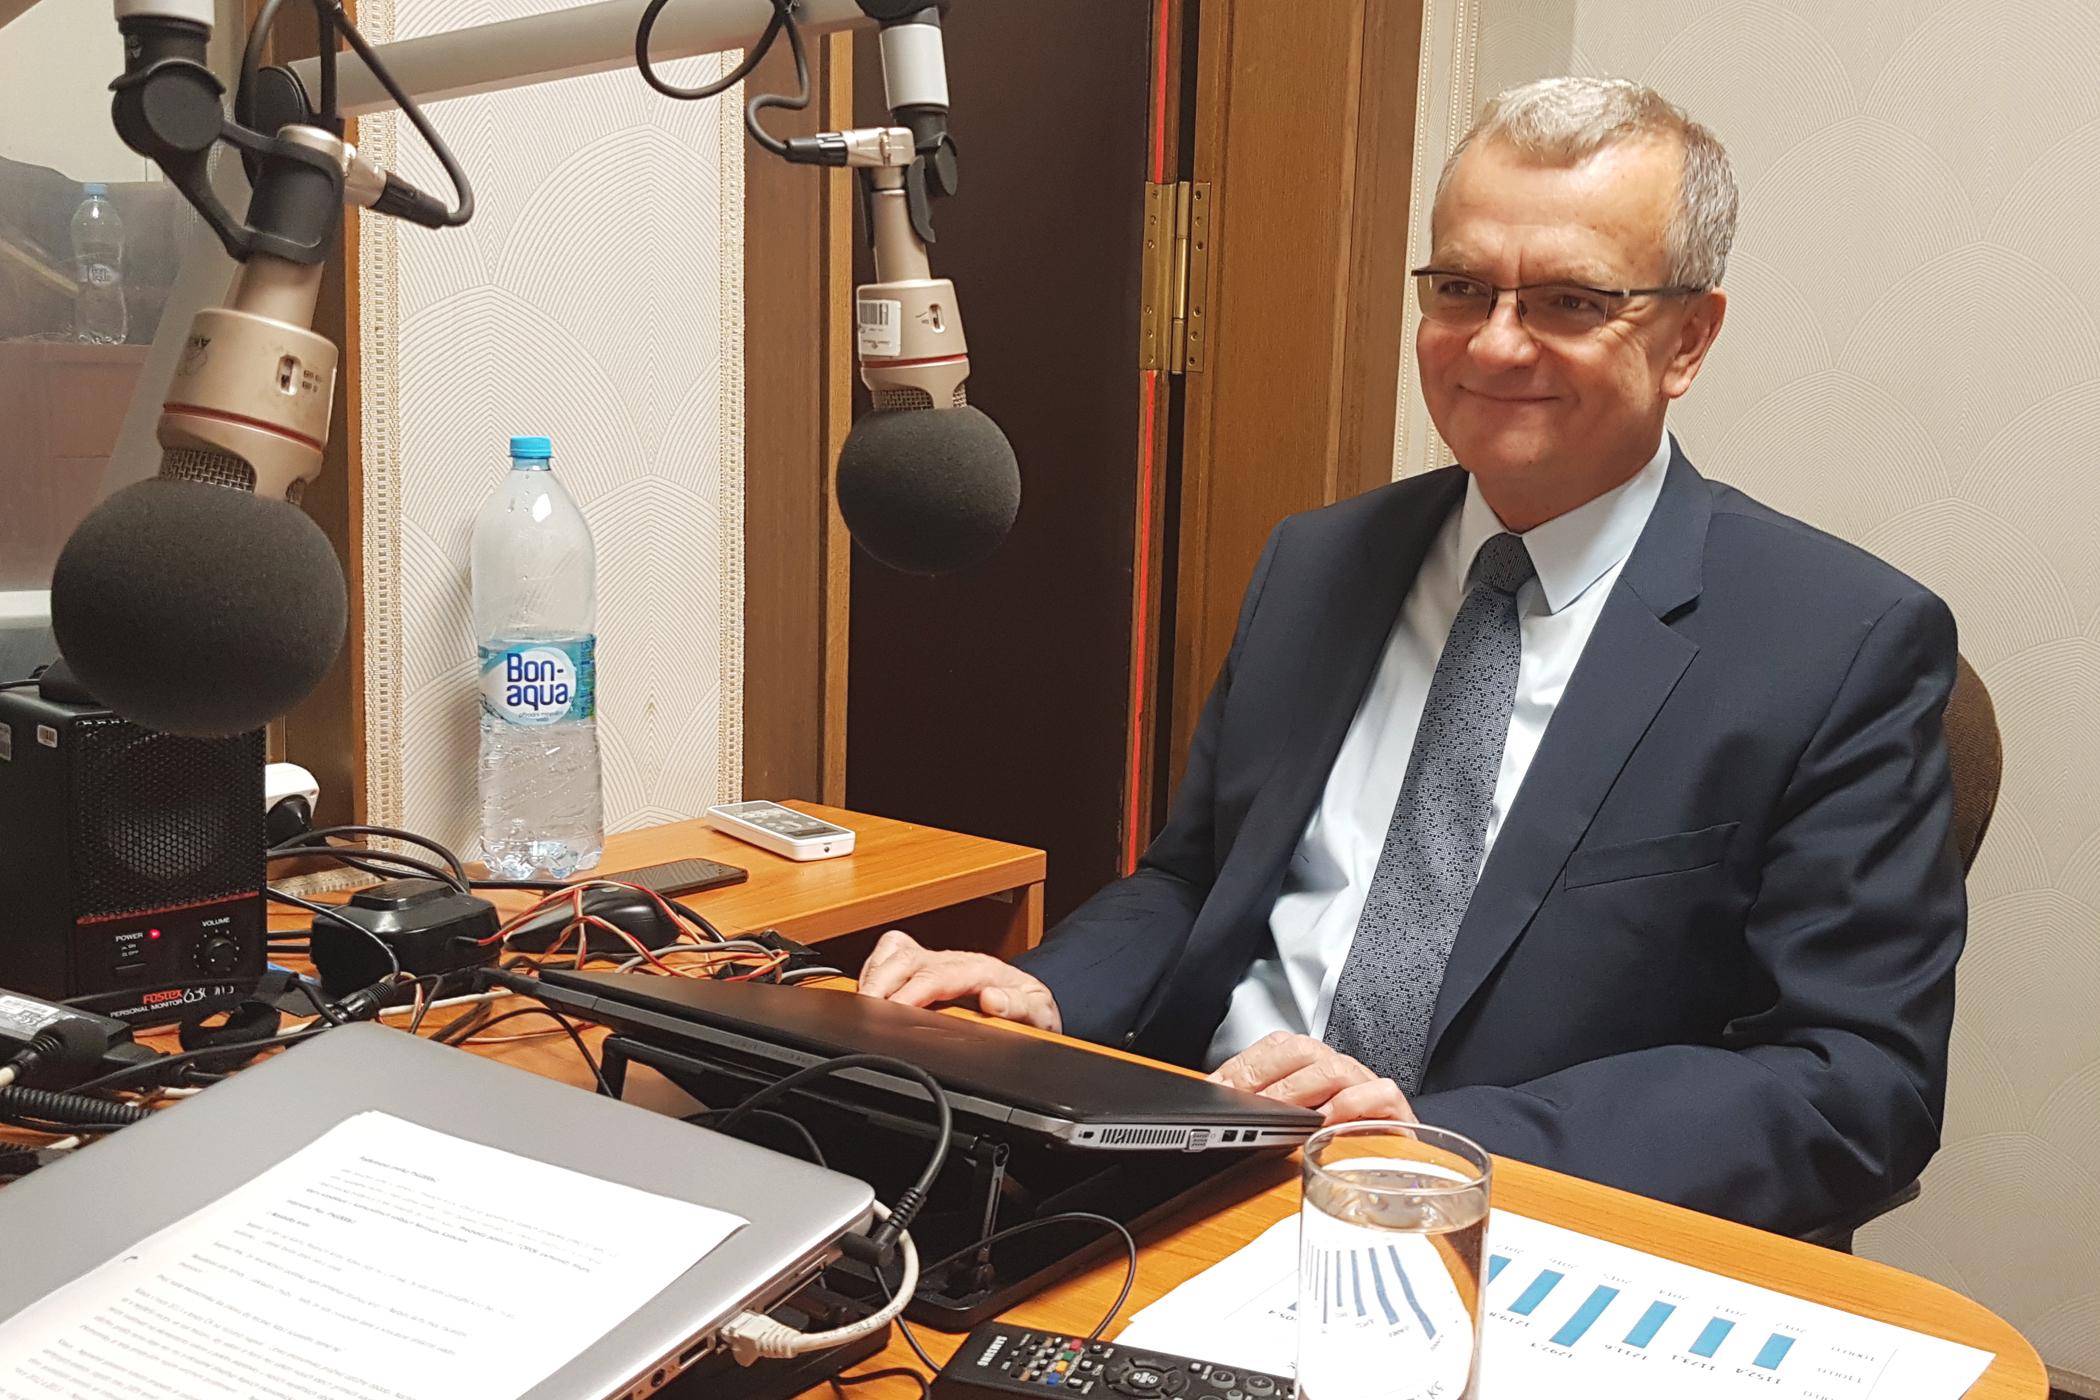 Předseda poslaneckého klubu TOP 09 Miroslav Kalousek